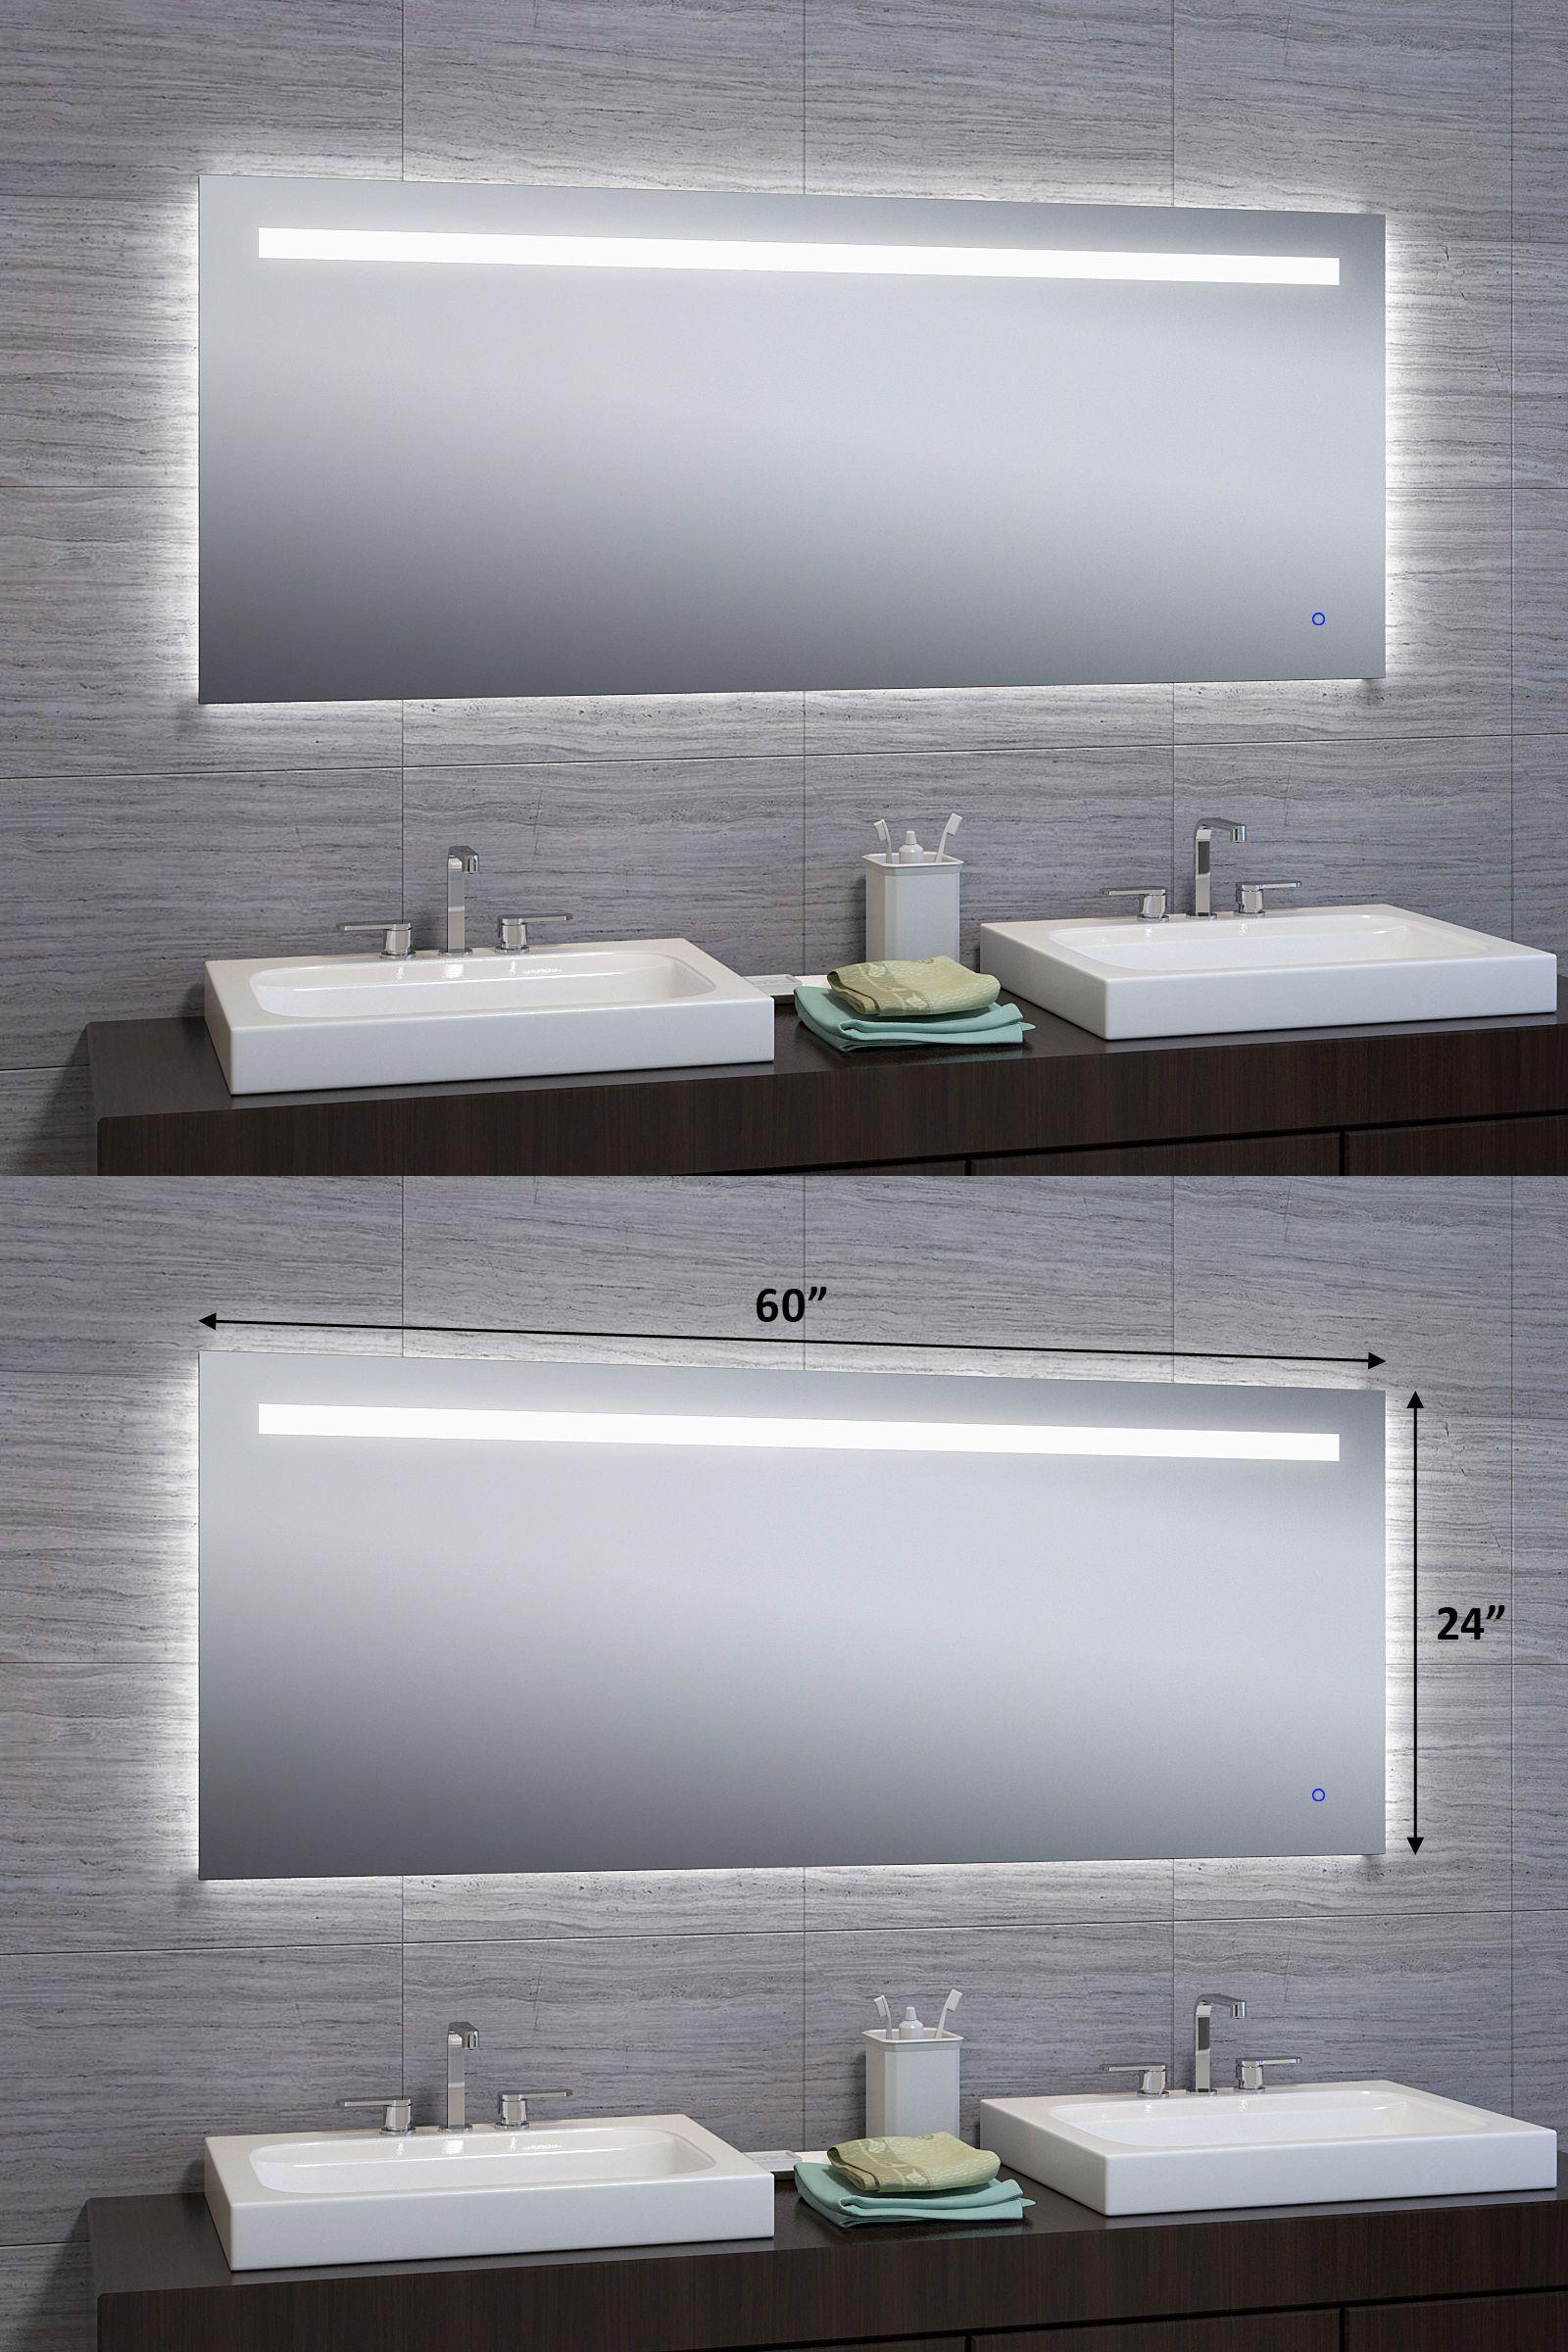 Mirrors x led illuminated wall mount bathroom vanity